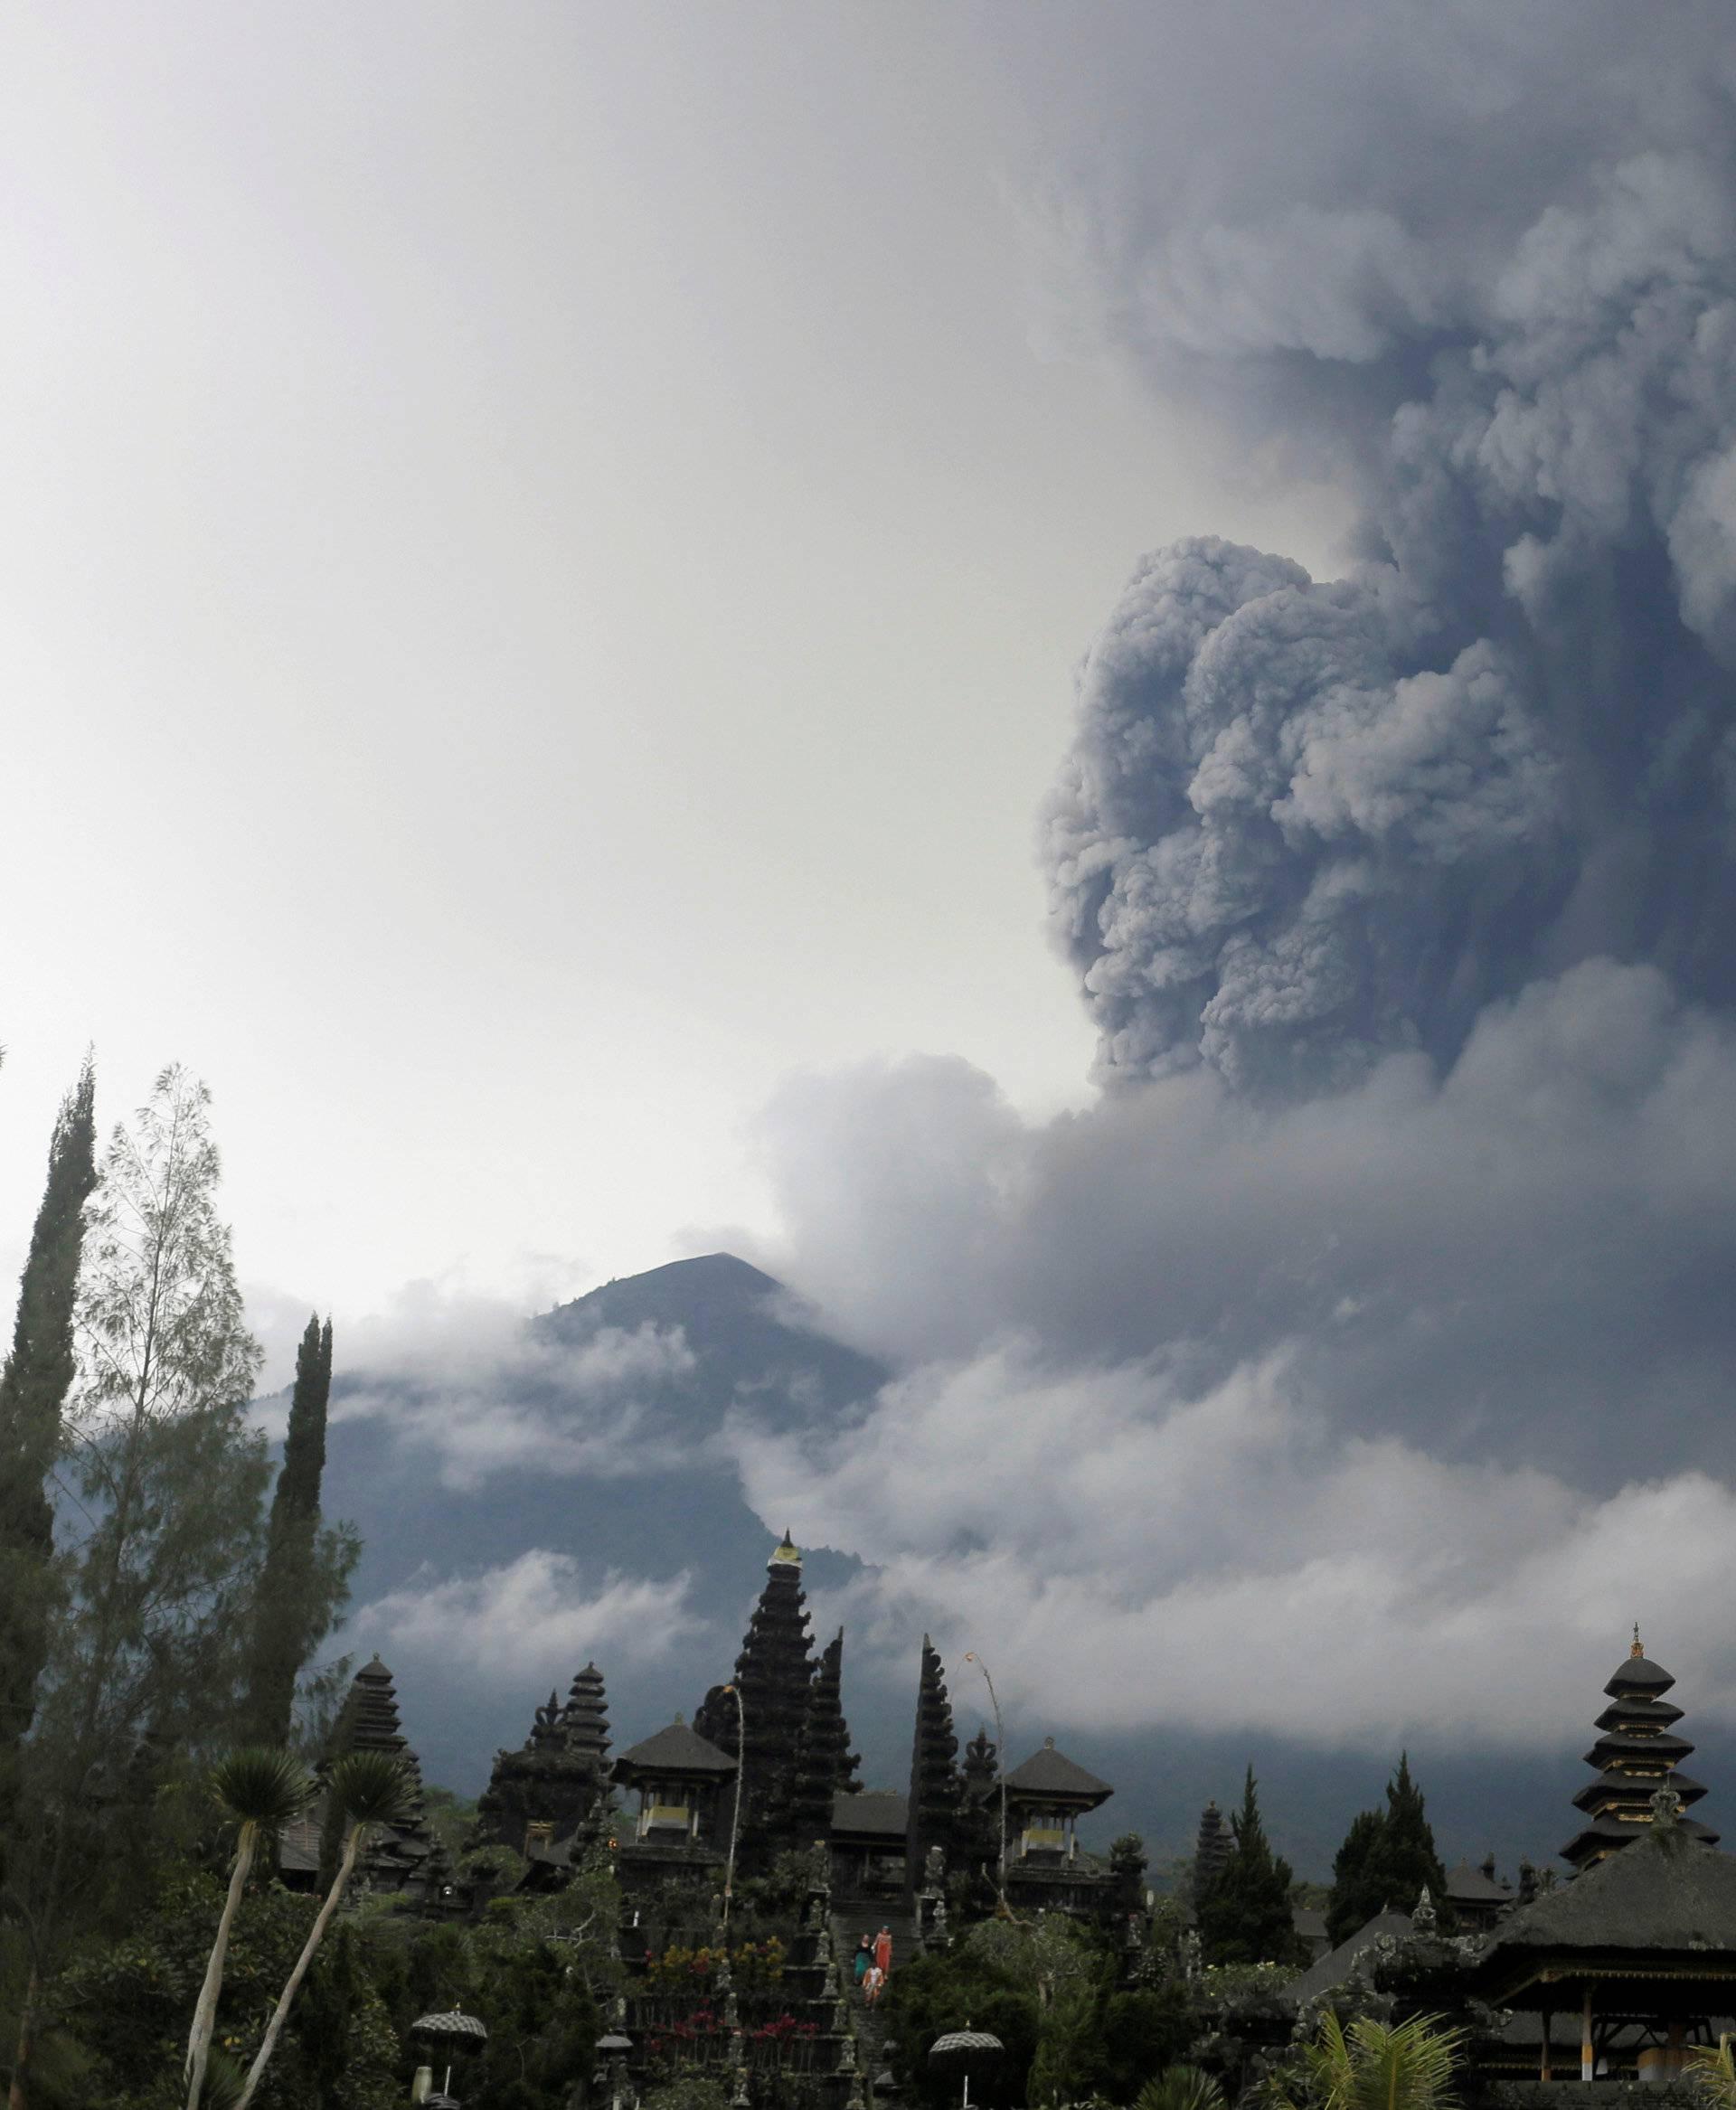 Mount Agung volcano erupts as seen from Besakih Temple in Karangasem, Bali